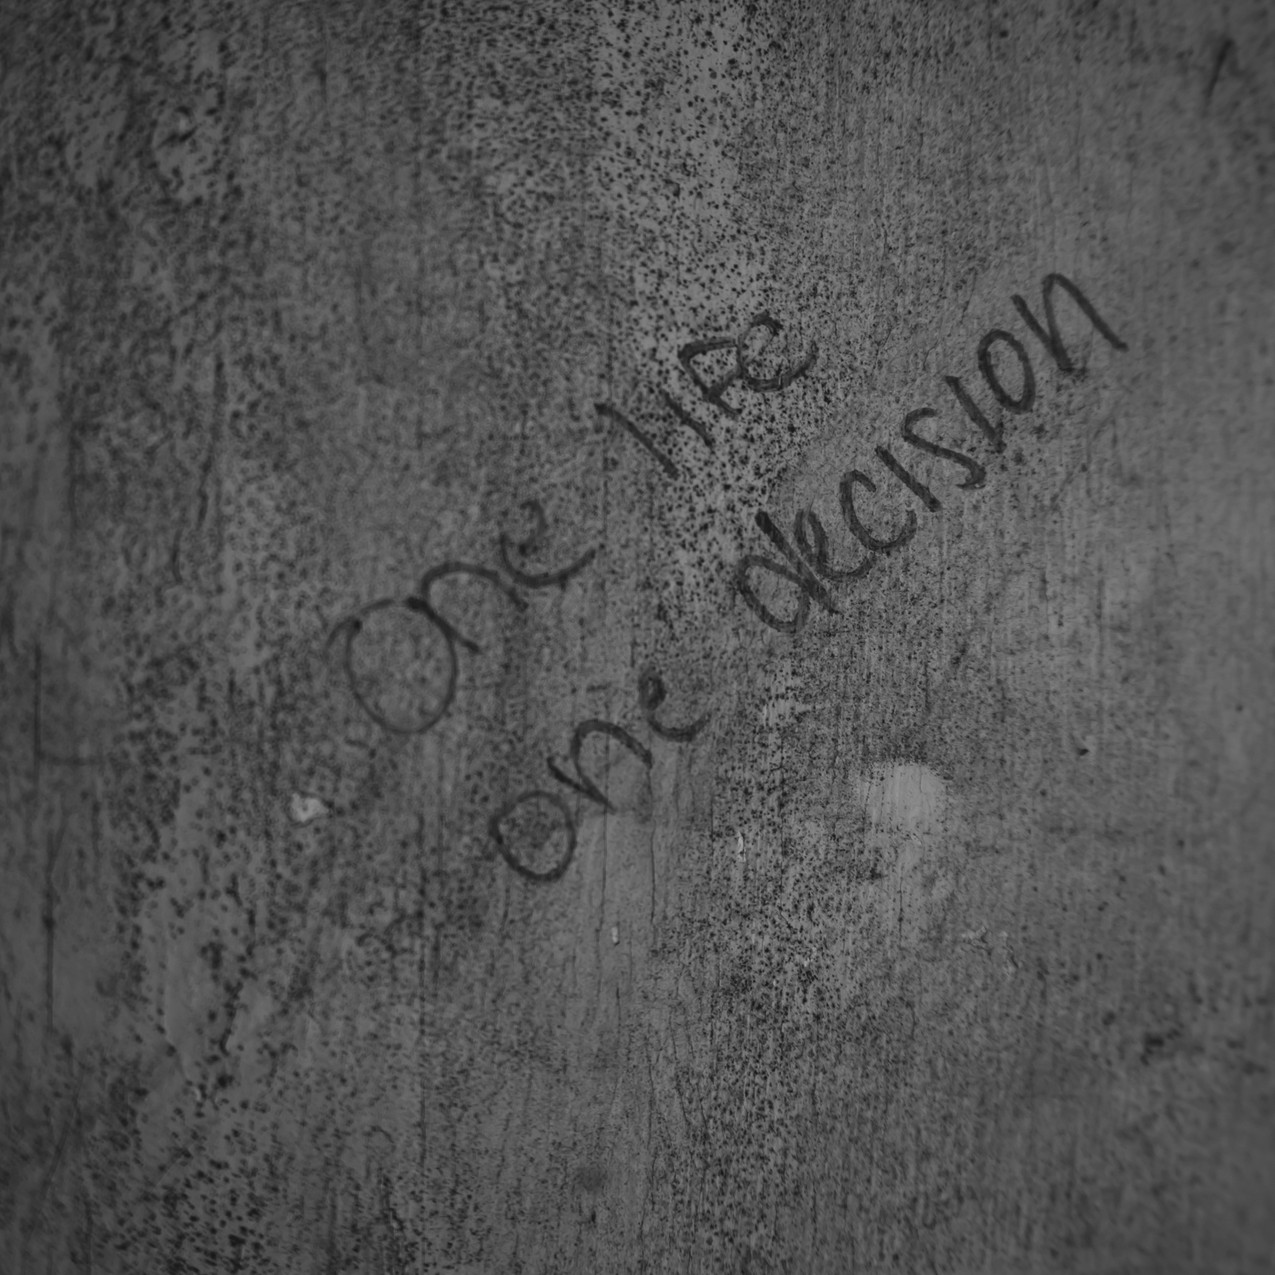 Abandoned Boys Prison - Charlotte, NC-9